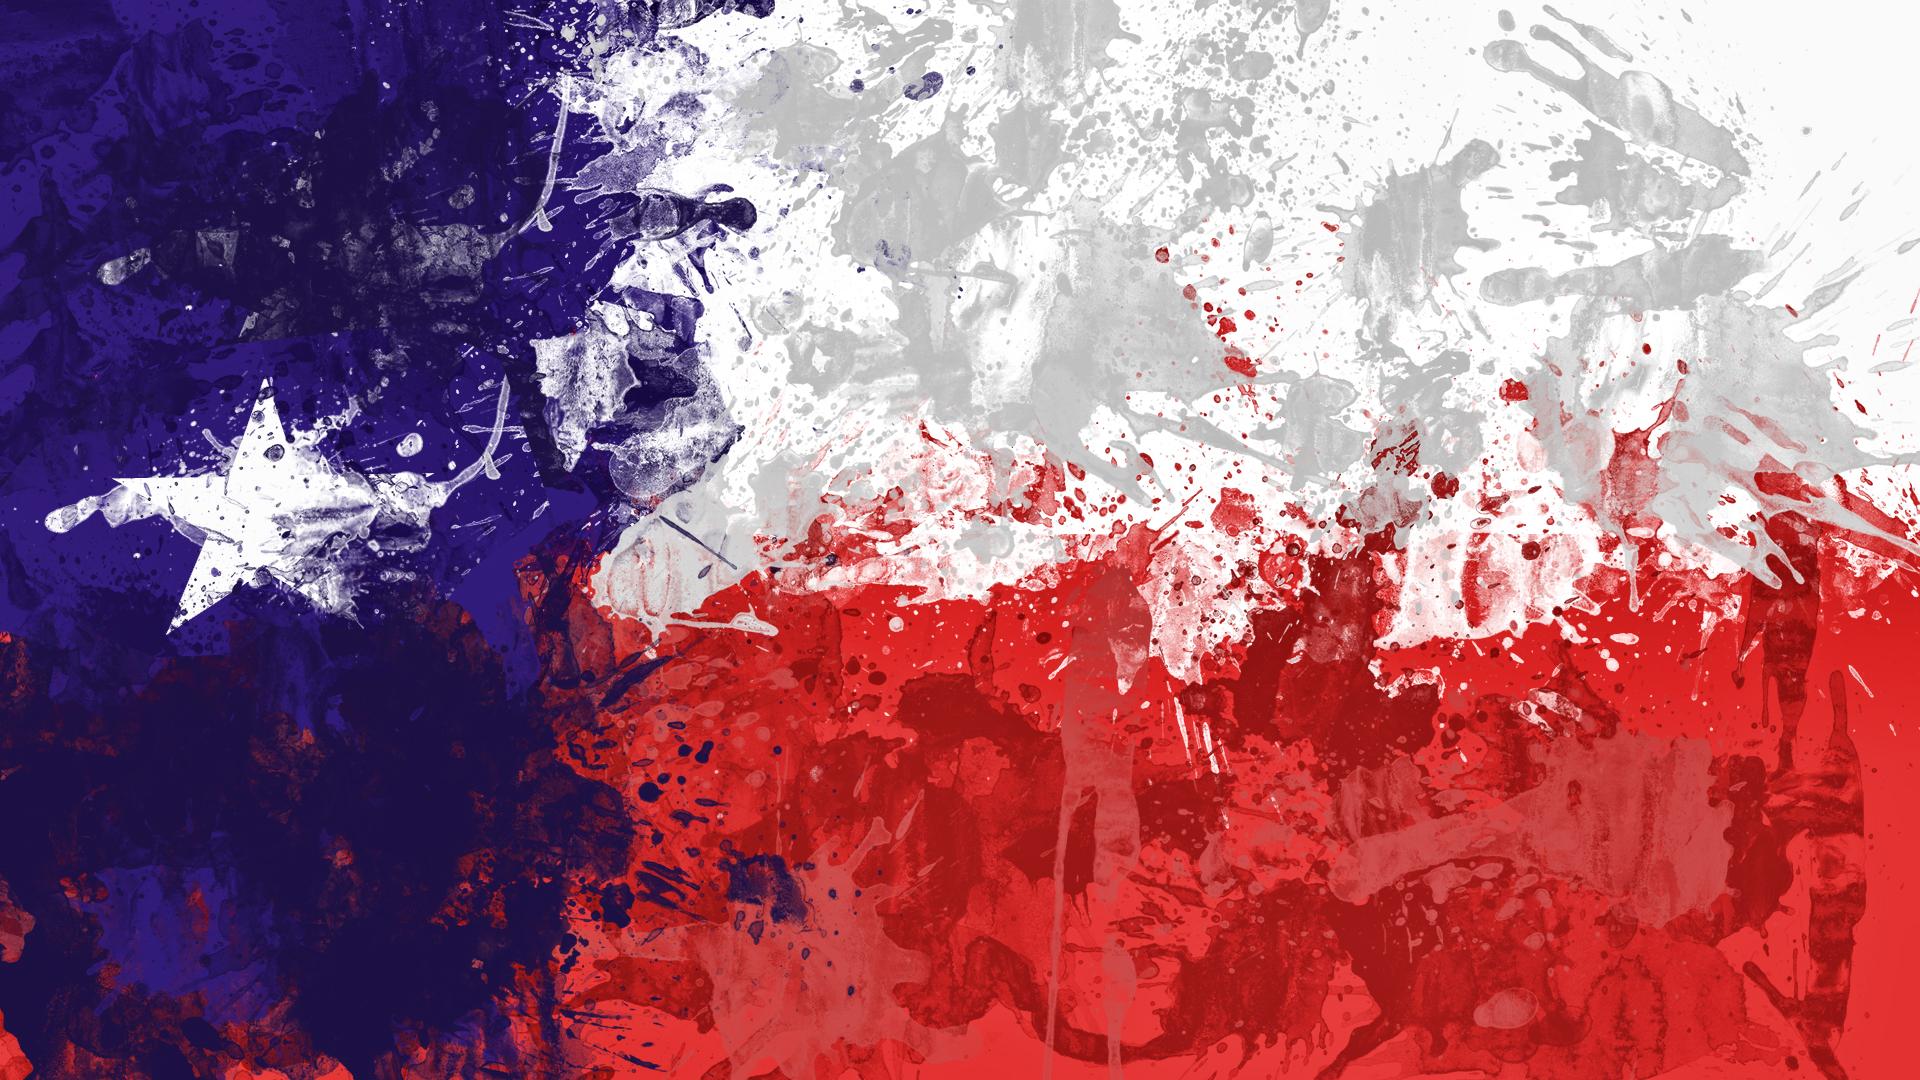 Flags Texas Wallpaper Flags Texas   Texas Backgrounds   1920x1080 1920x1080